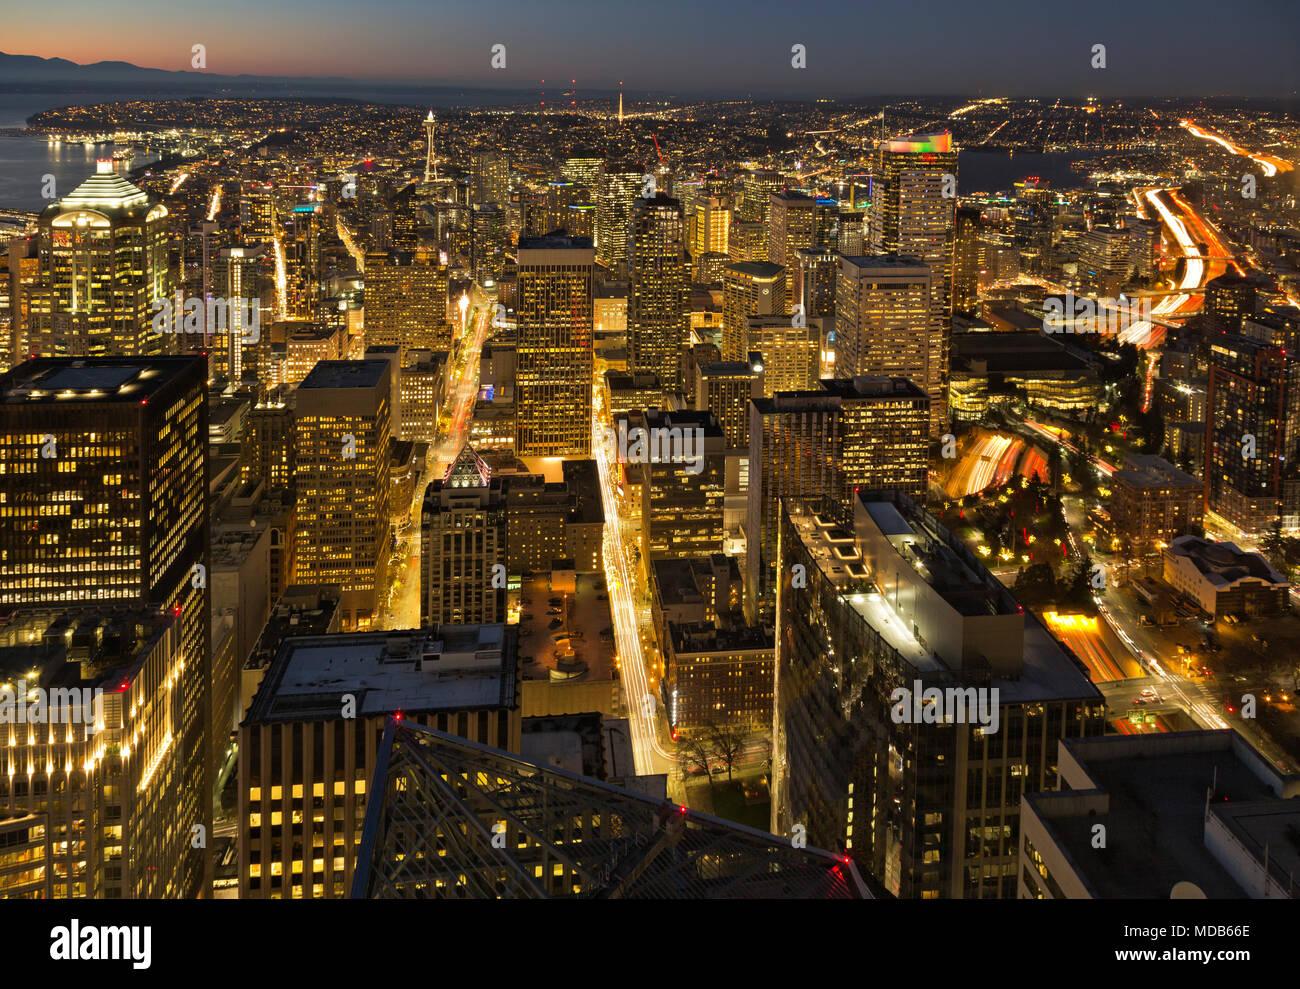 WA15300-00   WASHINGTON - View of downtown Seattle at dusk